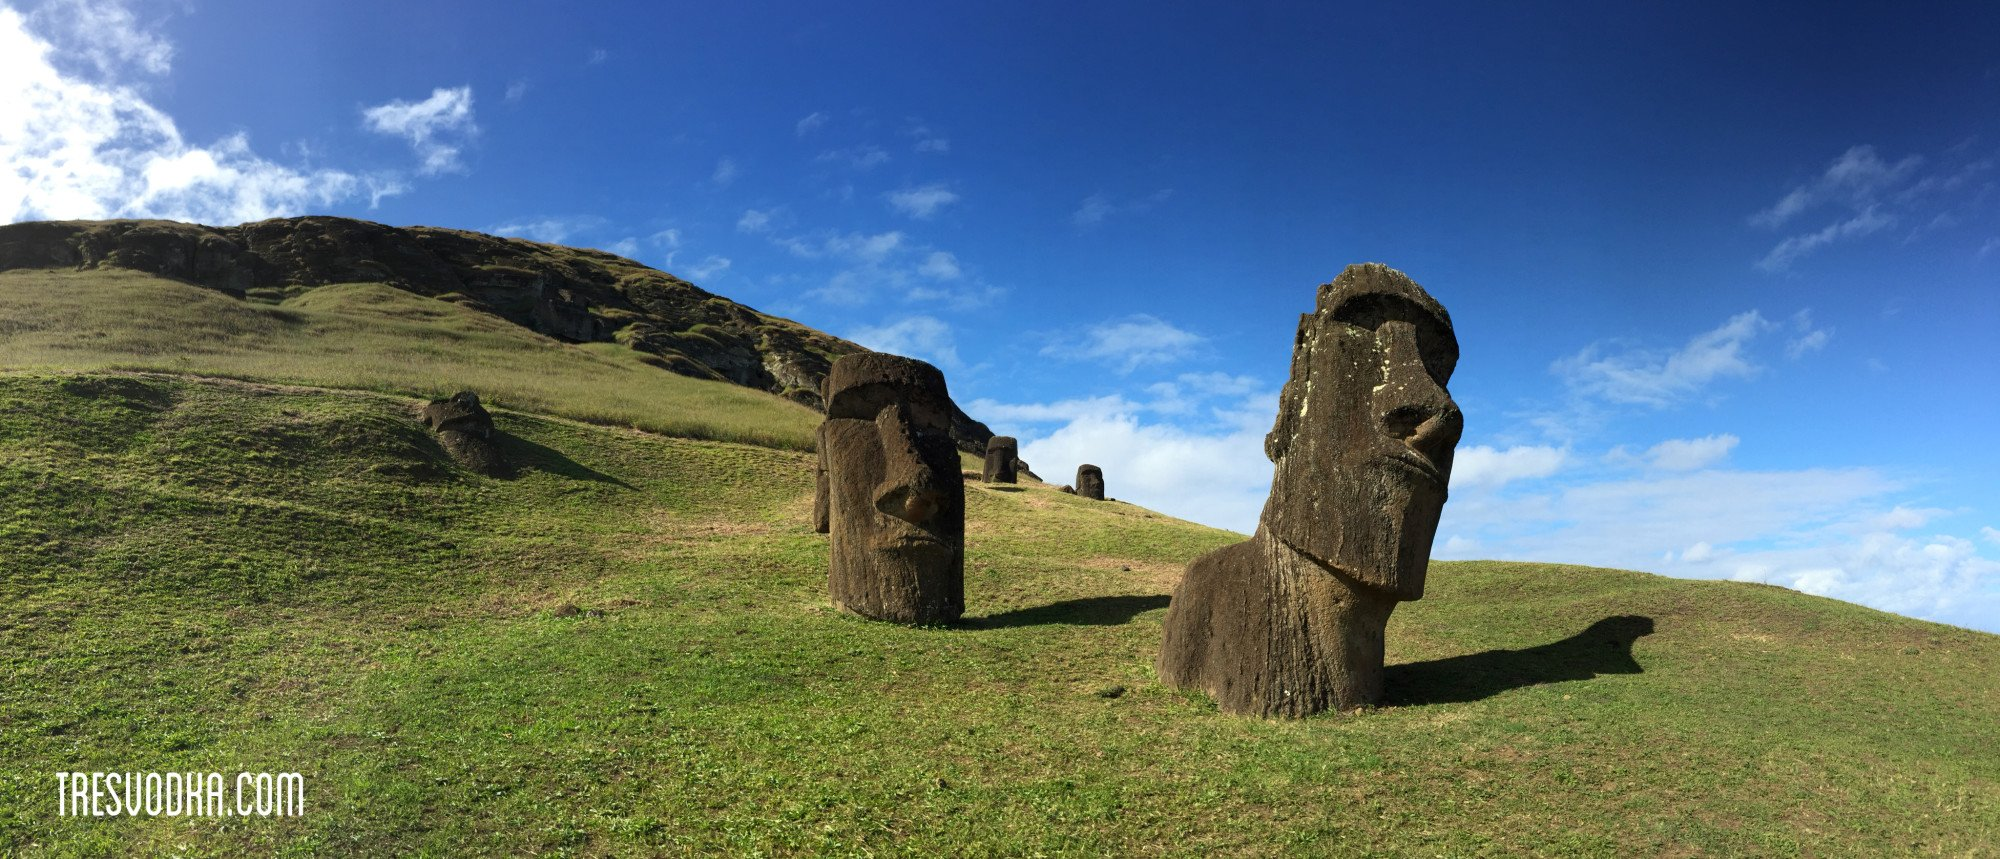 Kierunek na maj: Wyspa Wielkanocna!